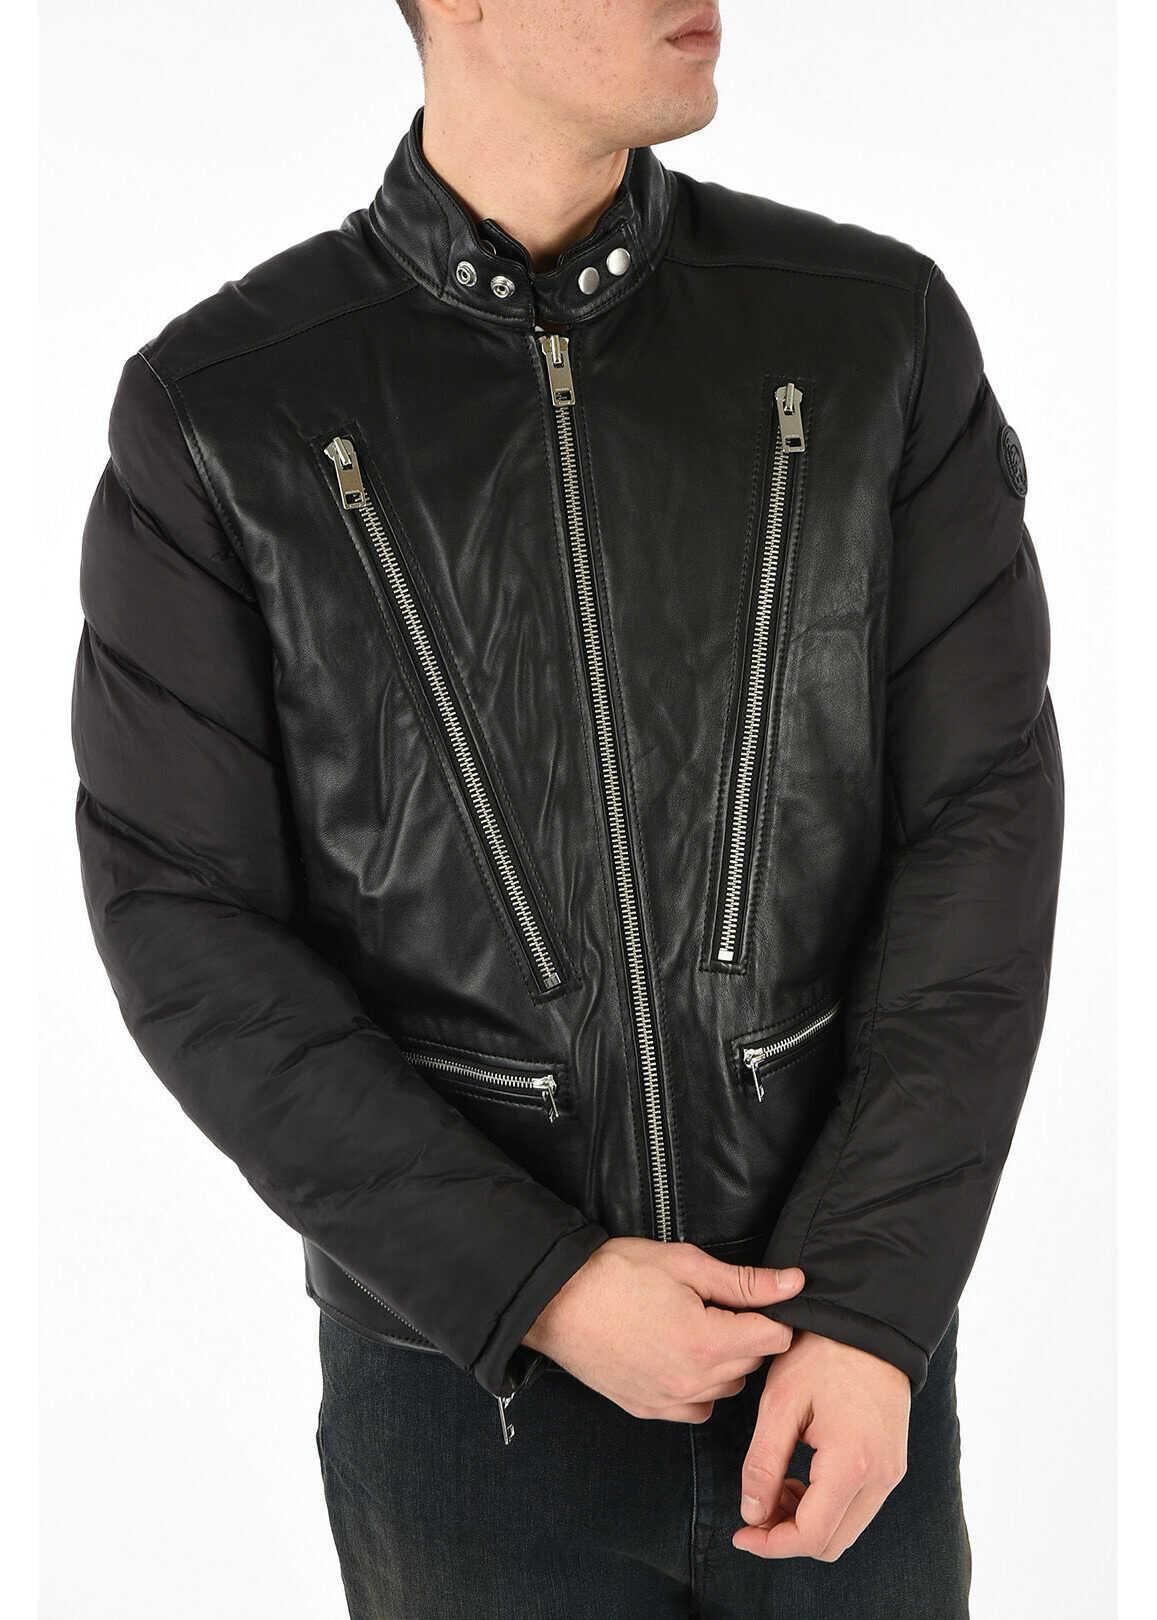 Diesel Leather and Nylon L-WINTER Jacket BLACK imagine